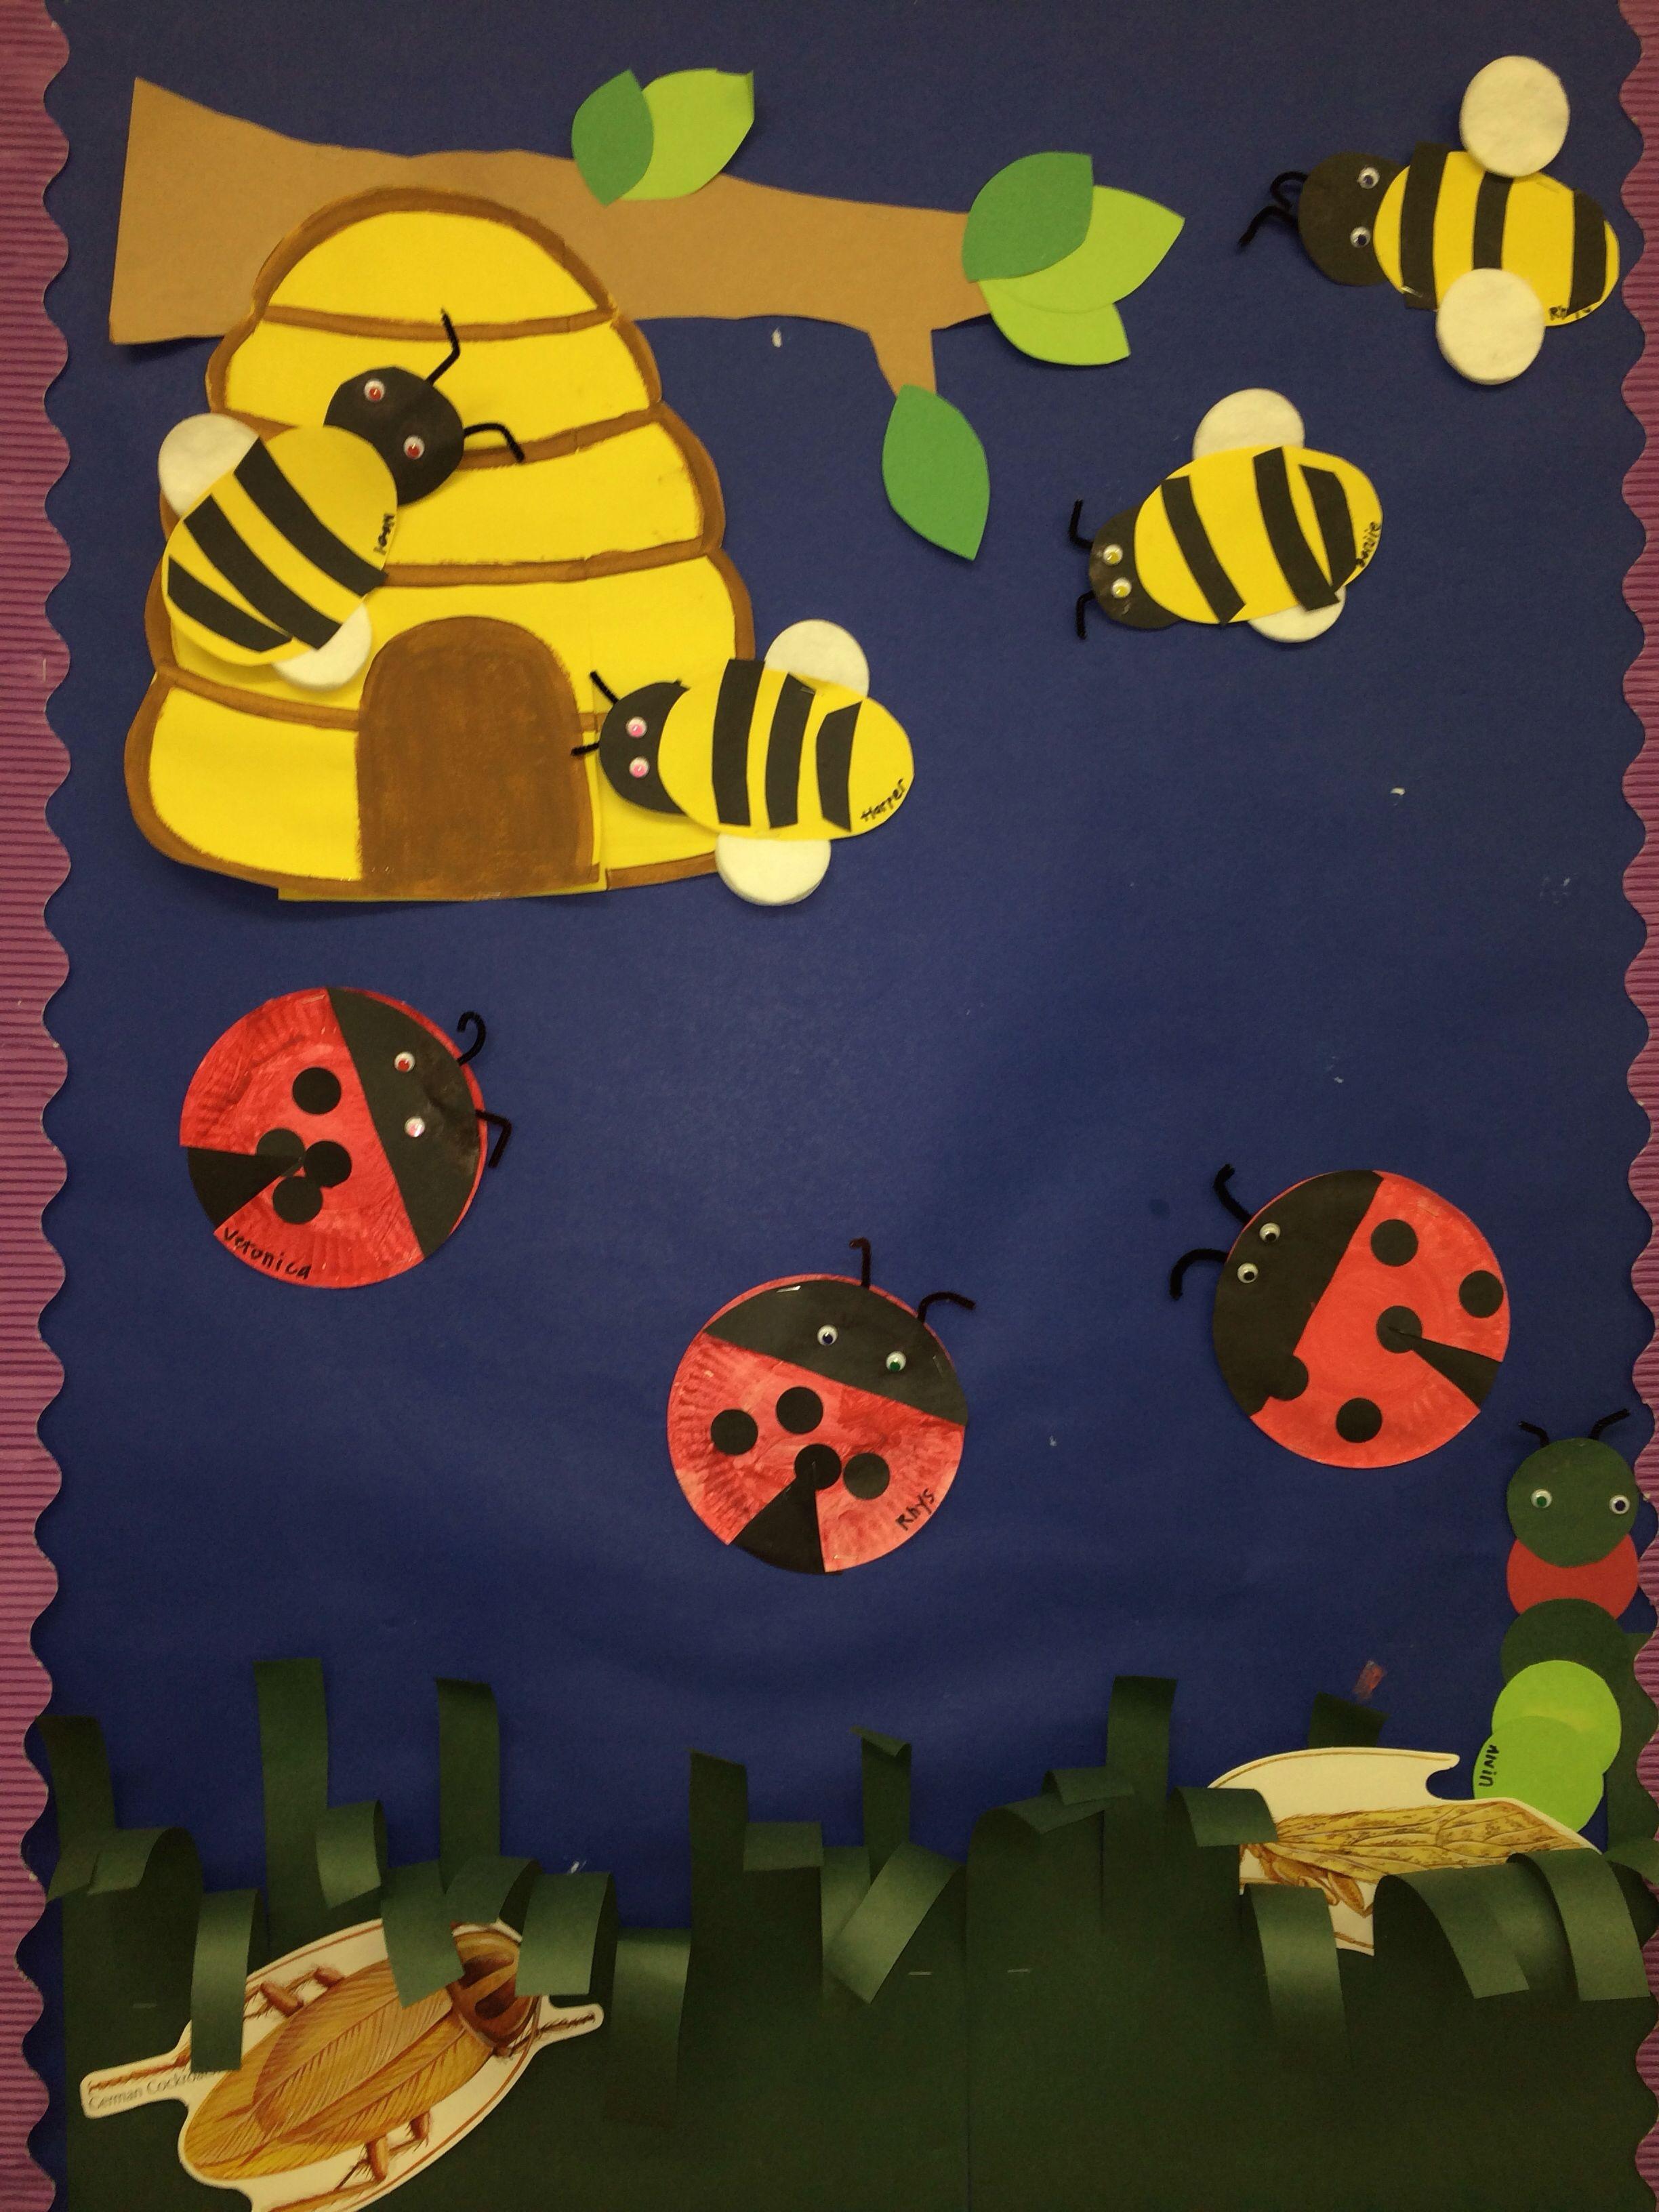 Insects Bumble Bees Caterpillars Ladybugs With Beehive Kids Calendar Preschool Bulletin Preschool Bulletin Boards [ 3264 x 2448 Pixel ]